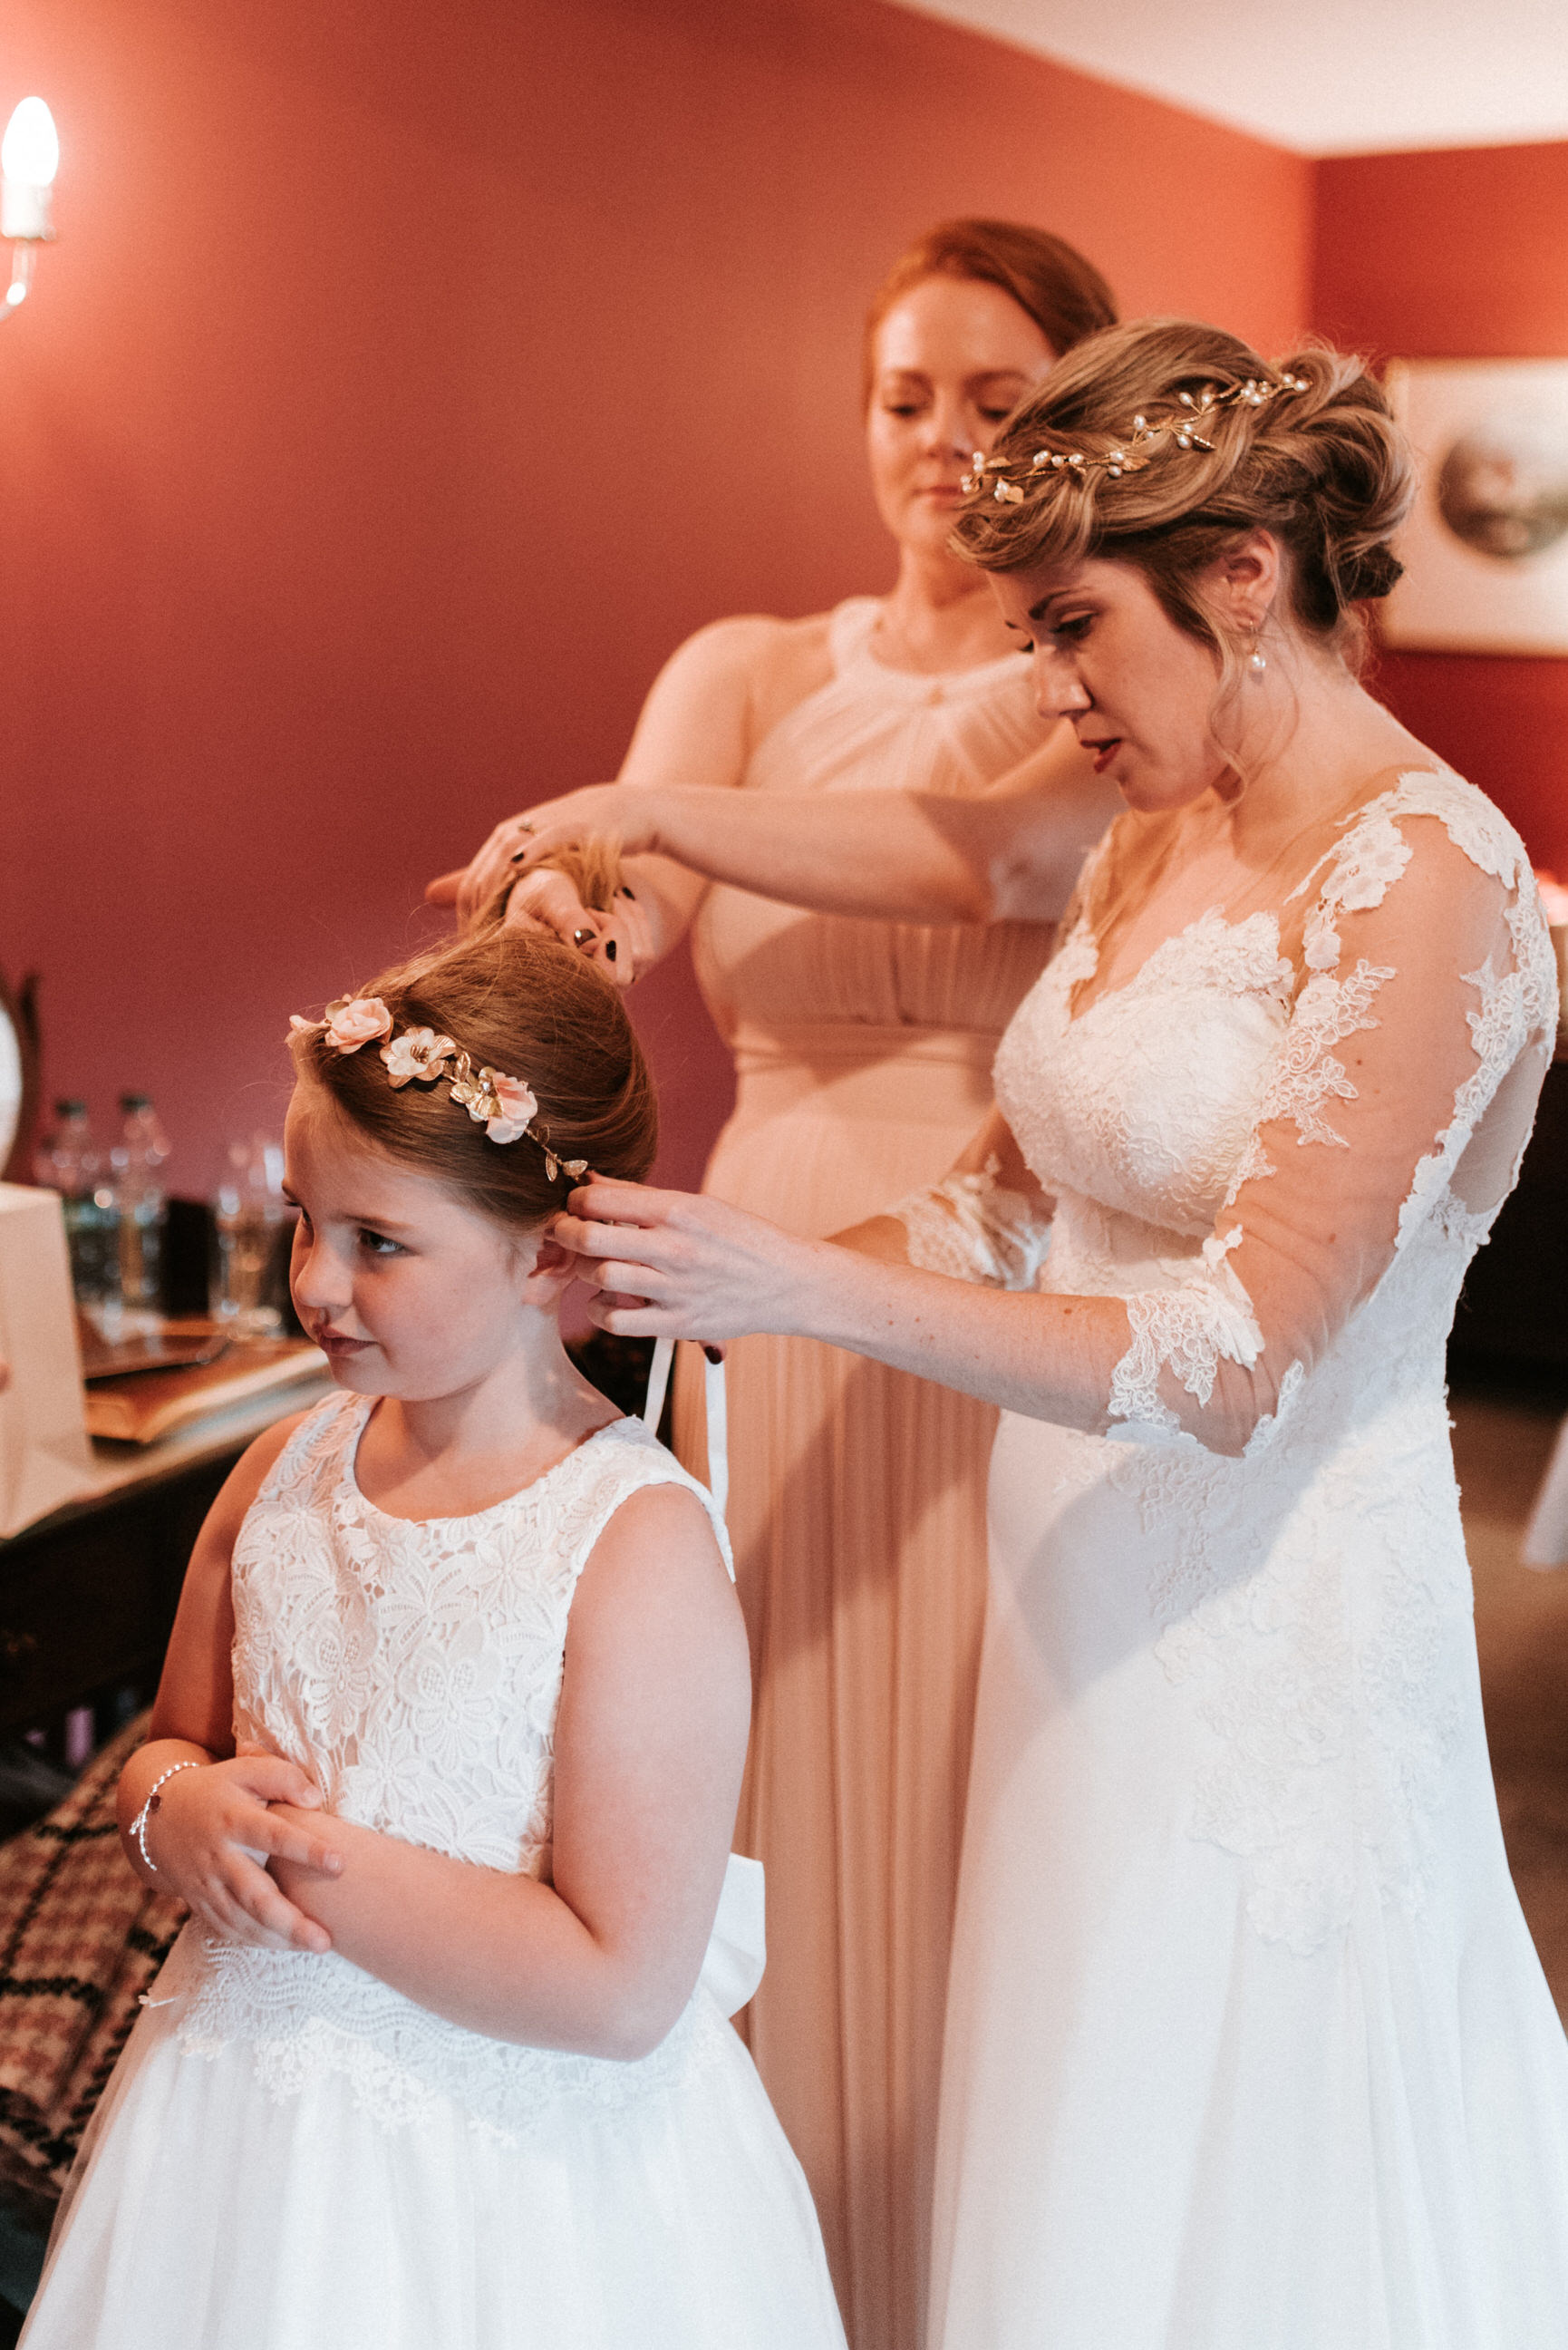 lissanoure castle wedding, northern ireland wedding photographer, romantic northern irish wedding venue, castle wedding ireland, natural wedding photography ni (39).jpg